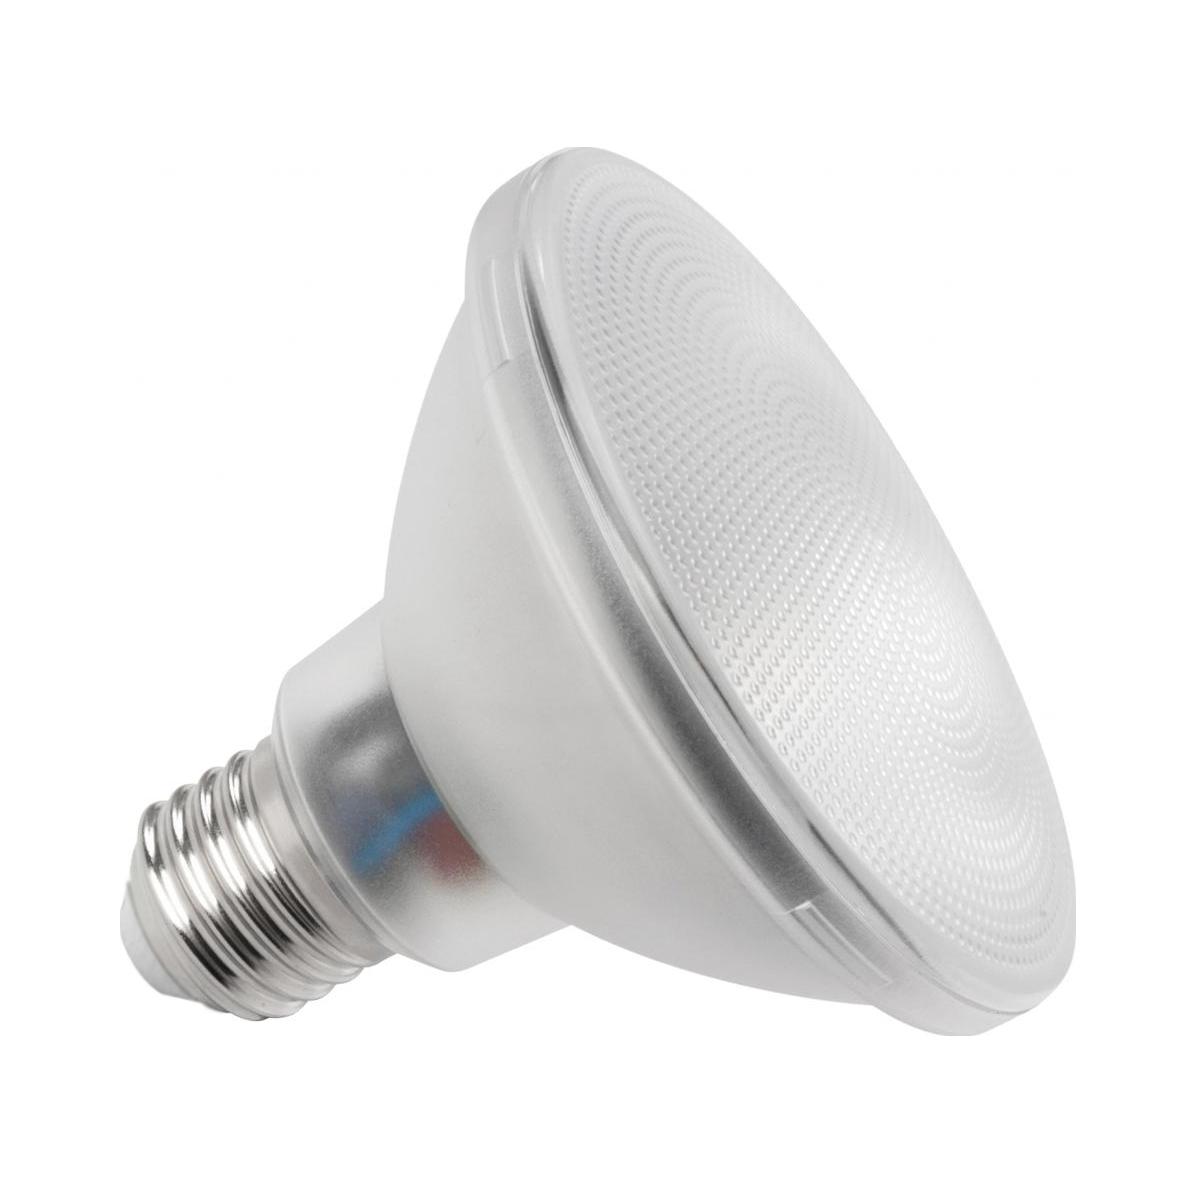 Par 30S LED KS-verlichting - 700 lumen Warm wit - Led spot - Lichtbron - Nostalux